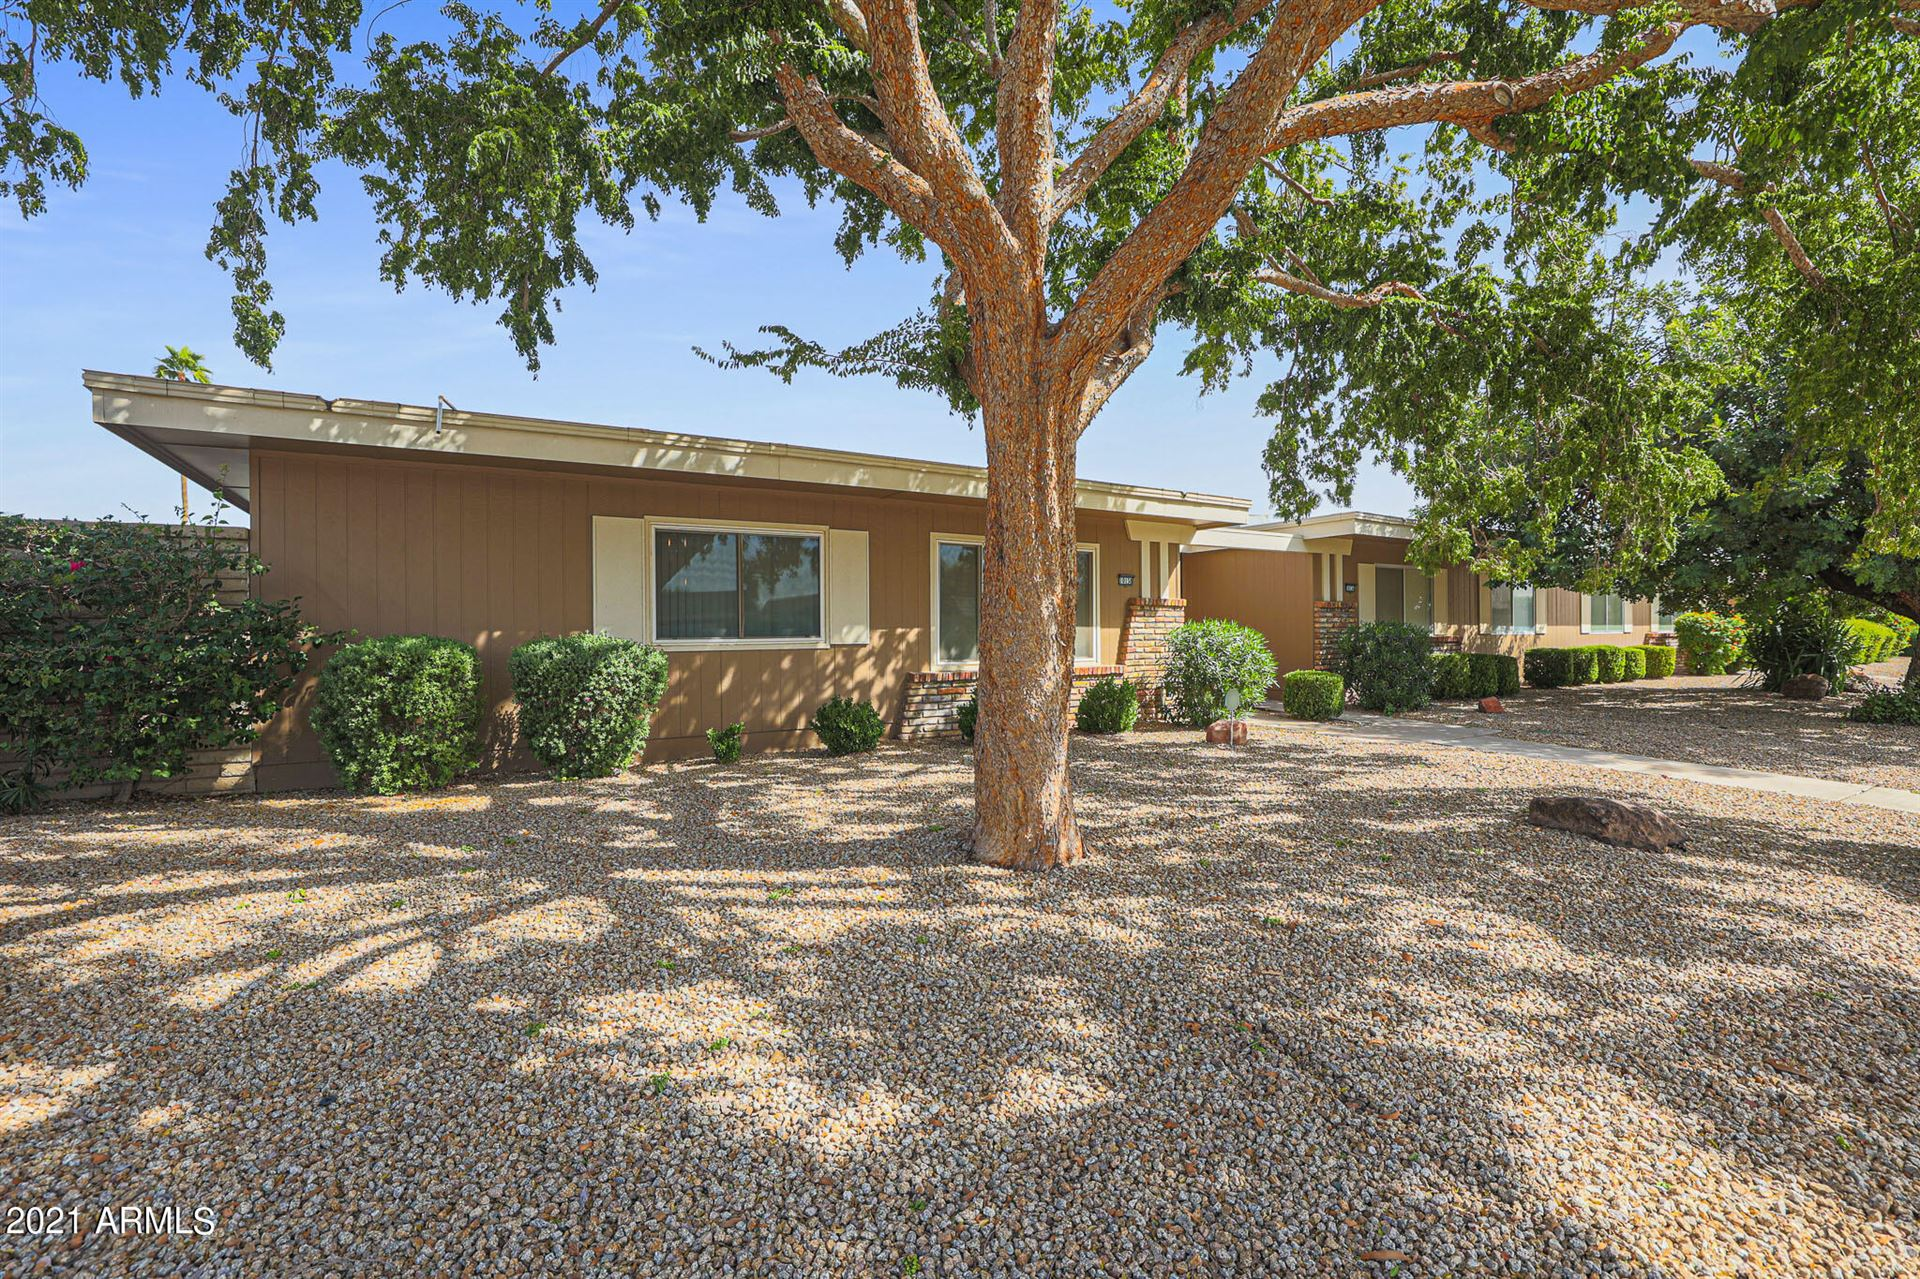 Photo of 10138 W HUTTON Drive, Sun City, AZ 85351 (MLS # 6305103)